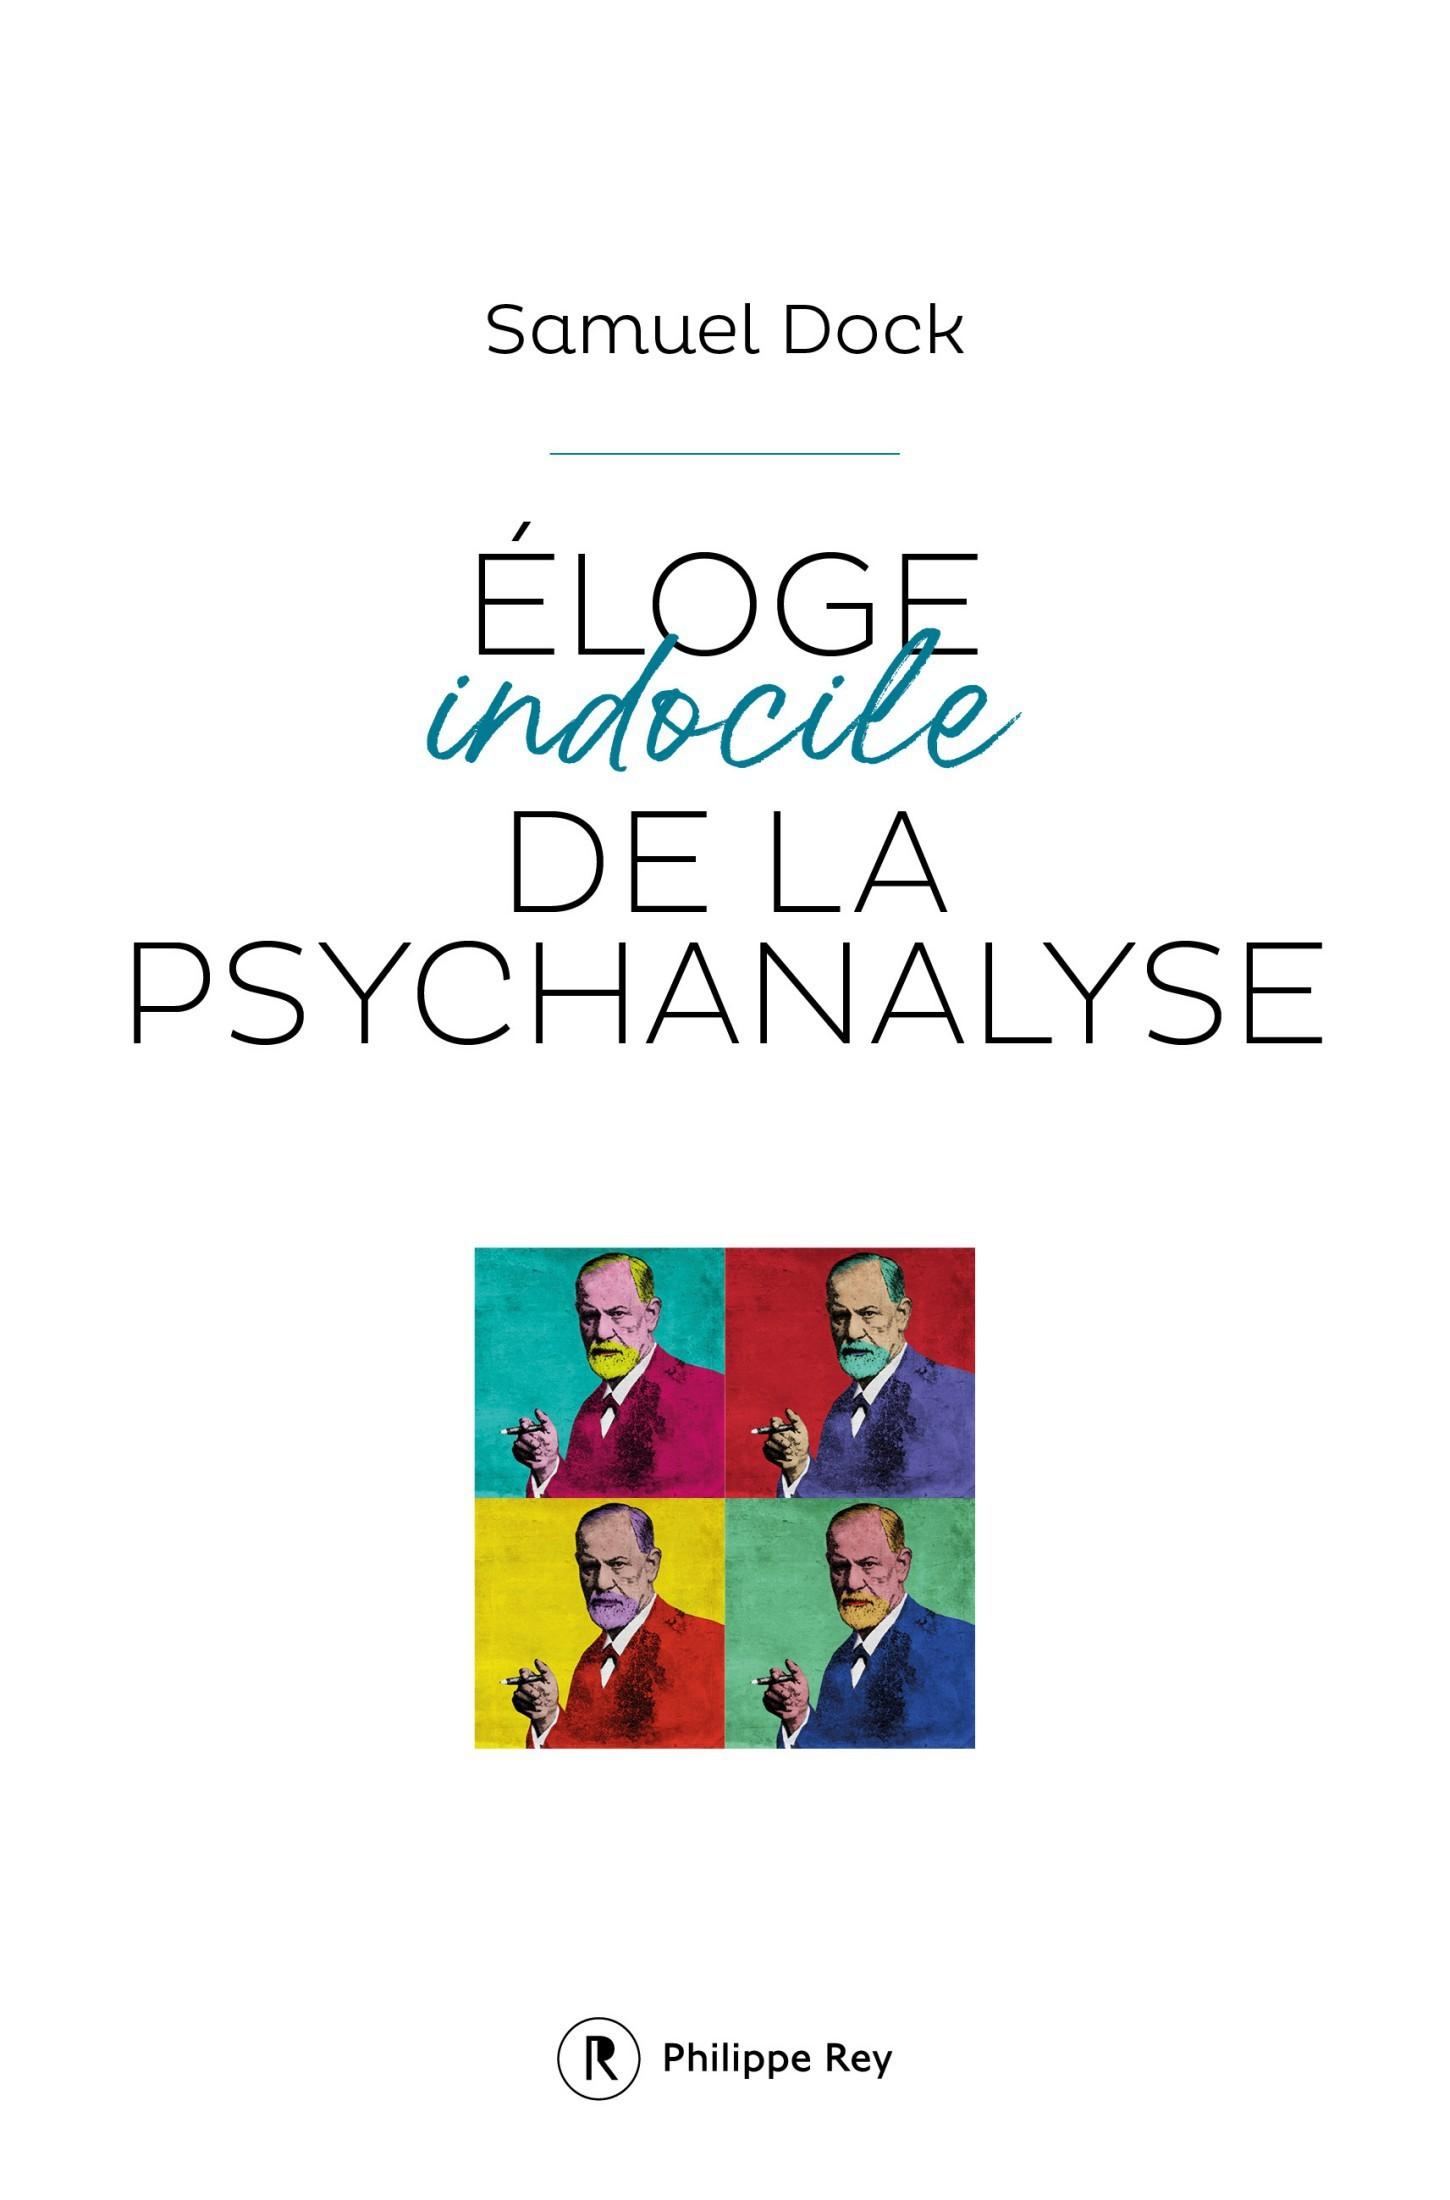 Samuel Dock – Éloge indocile de la psychanalyse (2019)